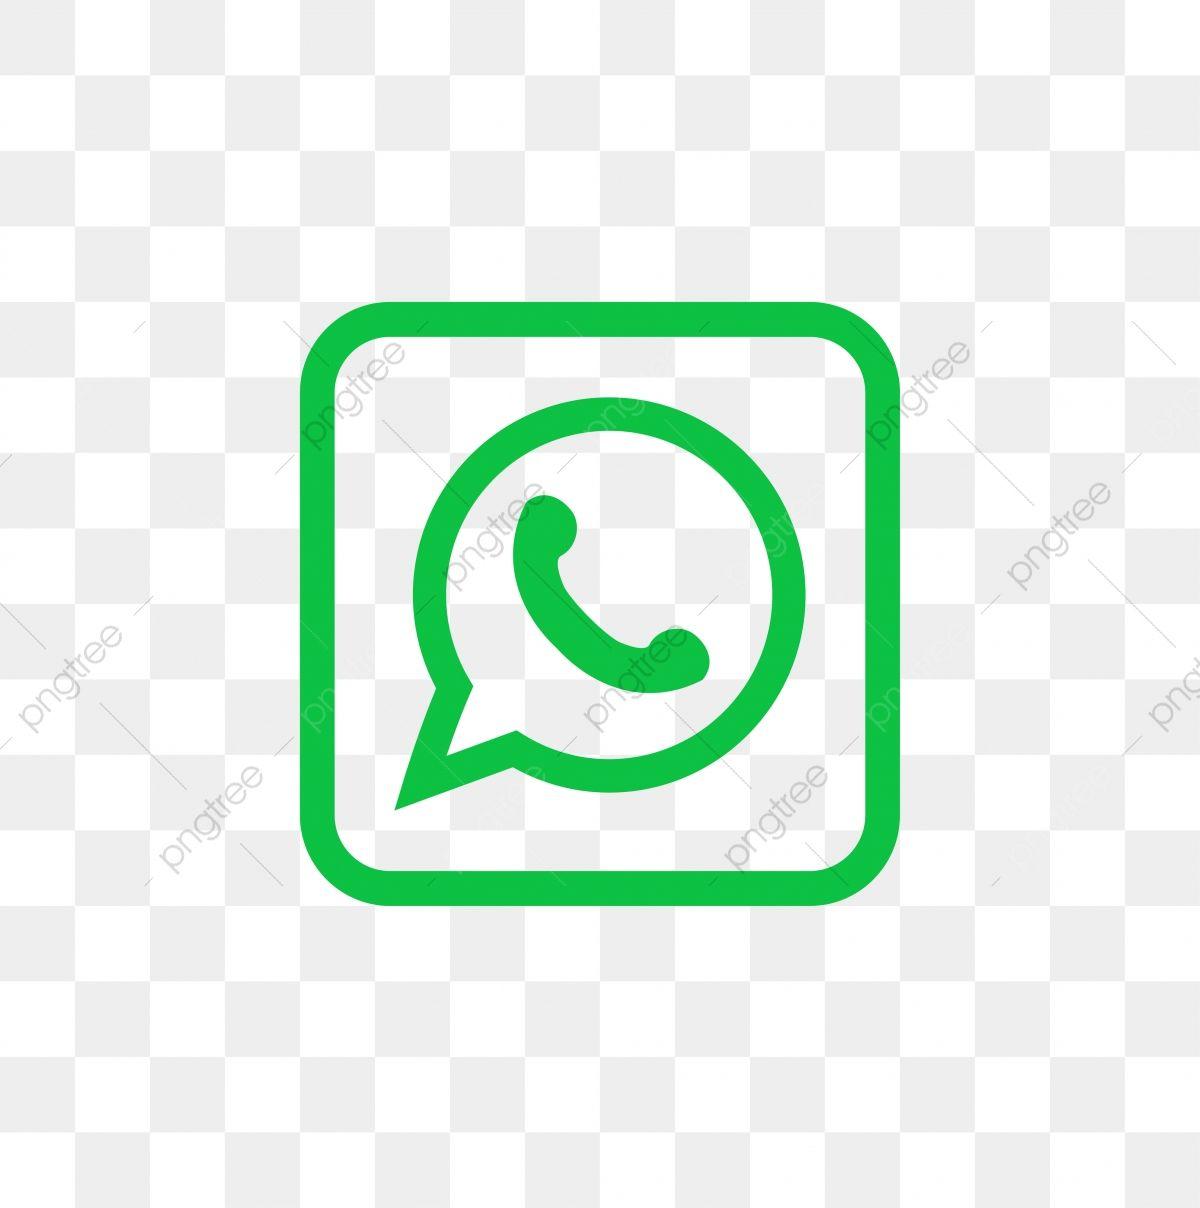 Whatsapp Social Media Icon Design Template Vector Whatsapp Logotipo Whatsapp Icone Logo Clipart Icones Whatsapp Icones Sociais Imagem Png E Vetor Para Downlo Social Media Icons Instagram Logo Social Media Icons